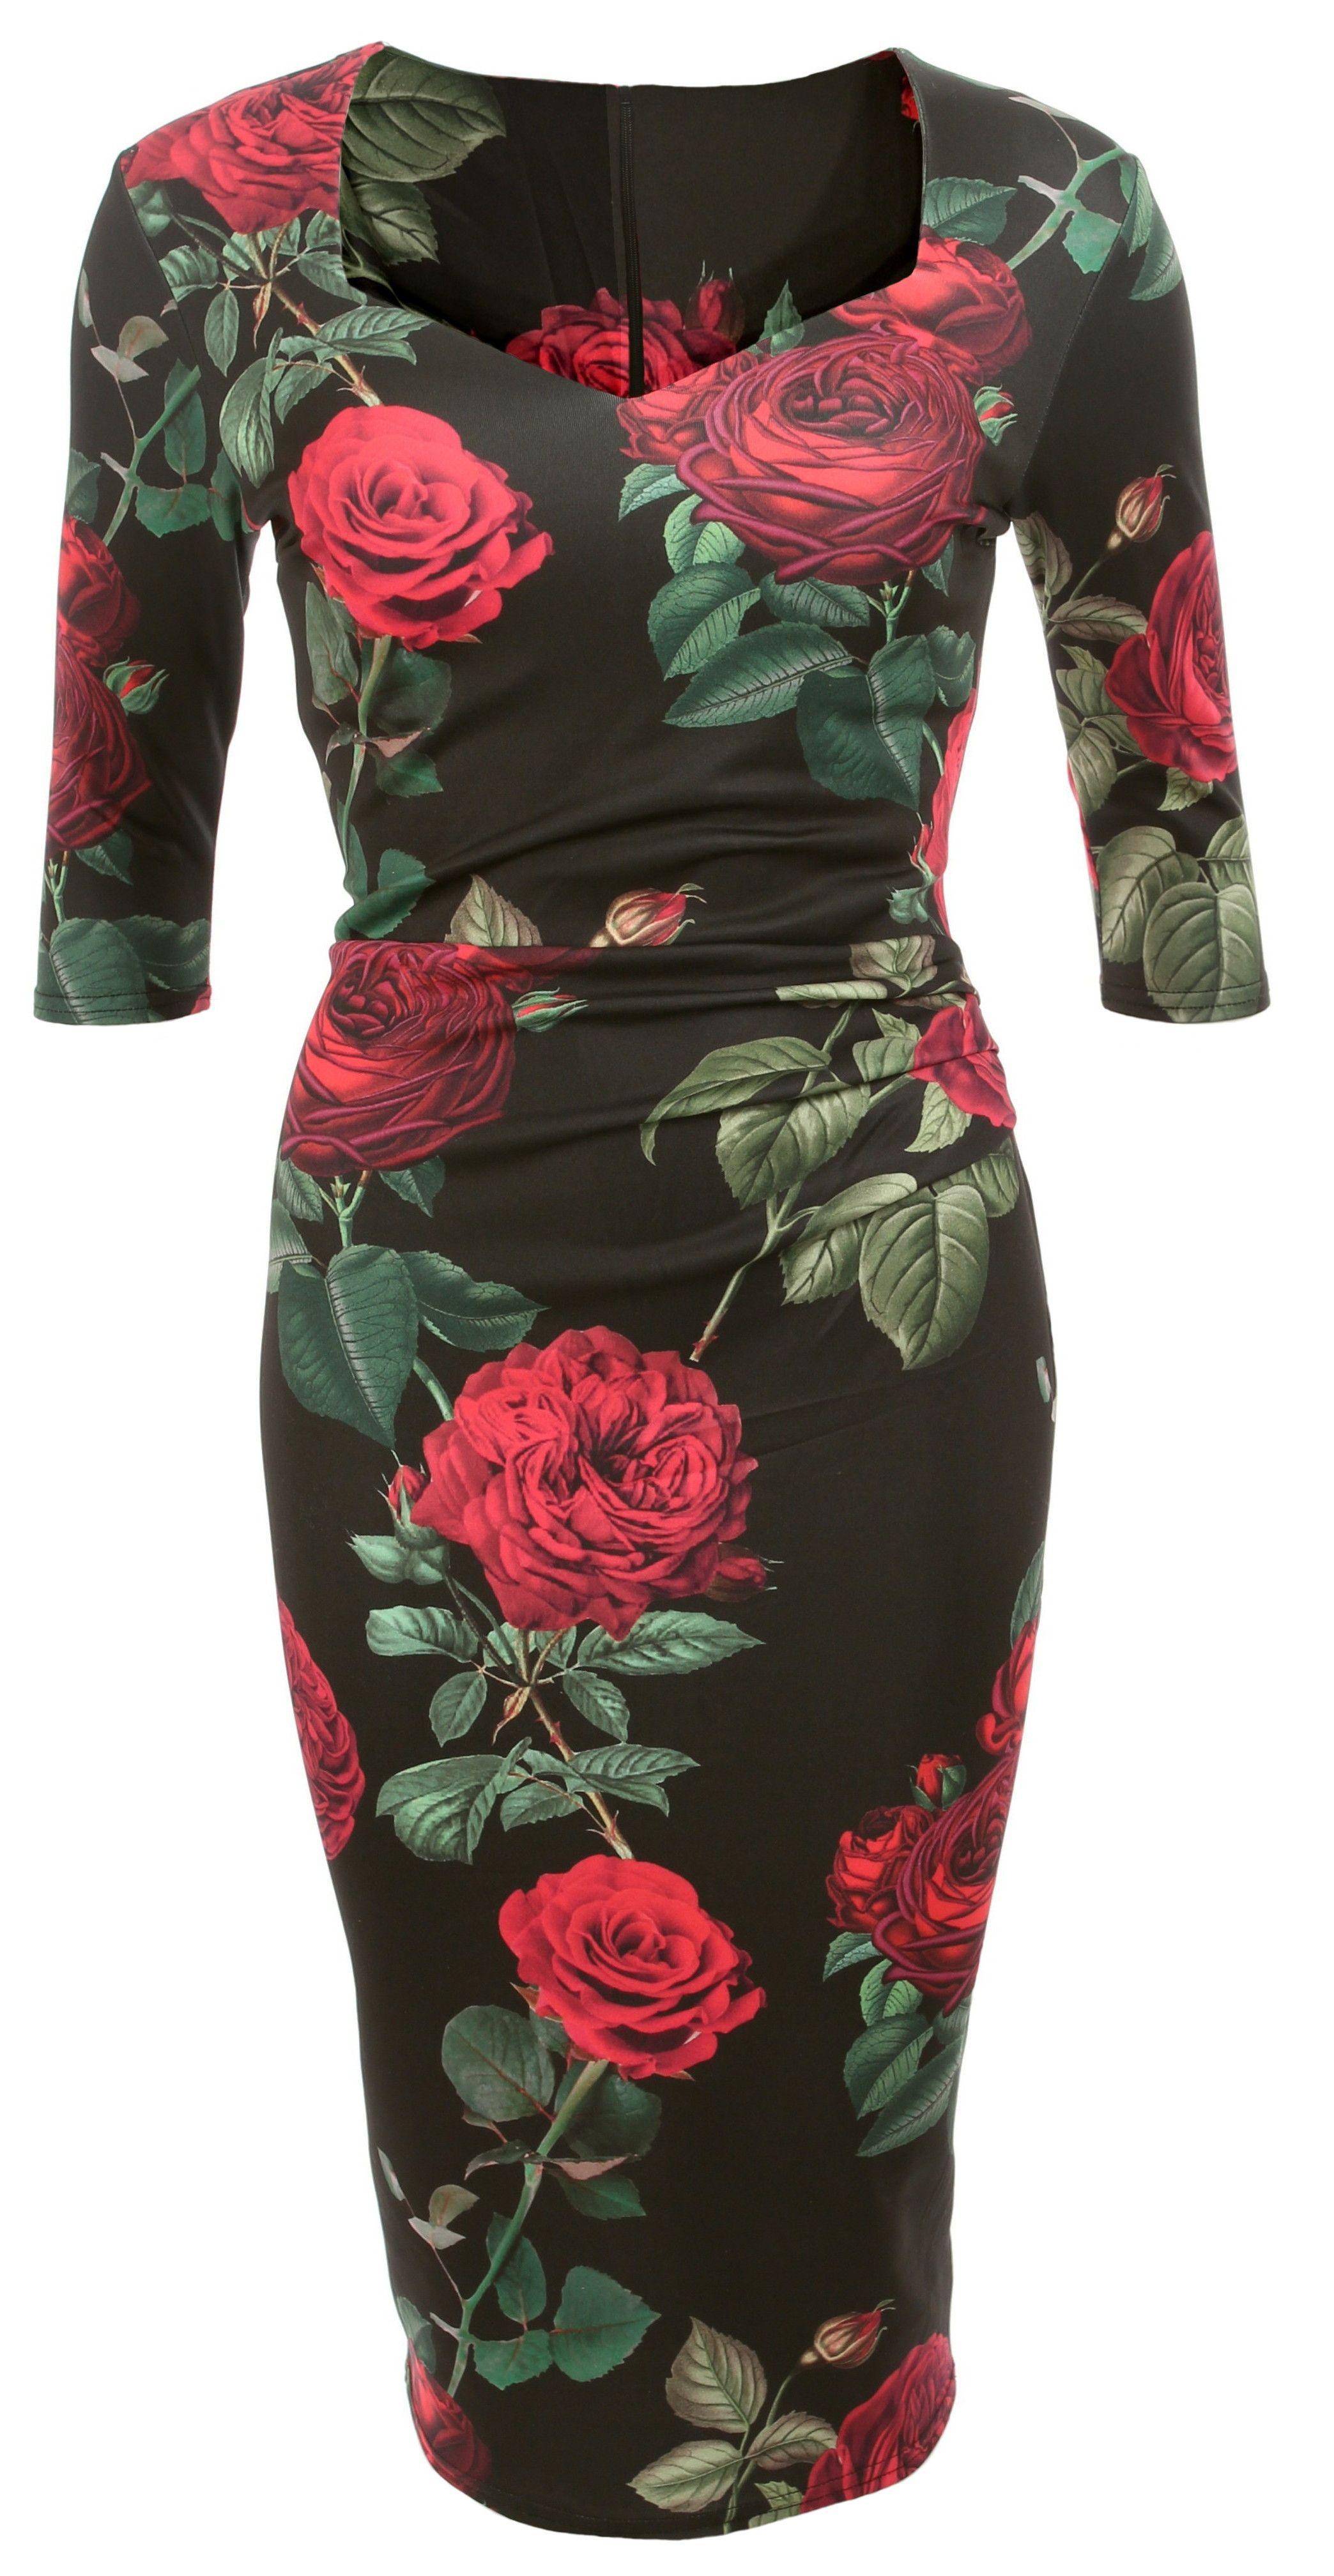 Black And Red Rose Print Midi Dress 49 99 Floral Bodycon Midi Dress Printed Midi Dress Dresses [ 4032 x 2088 Pixel ]